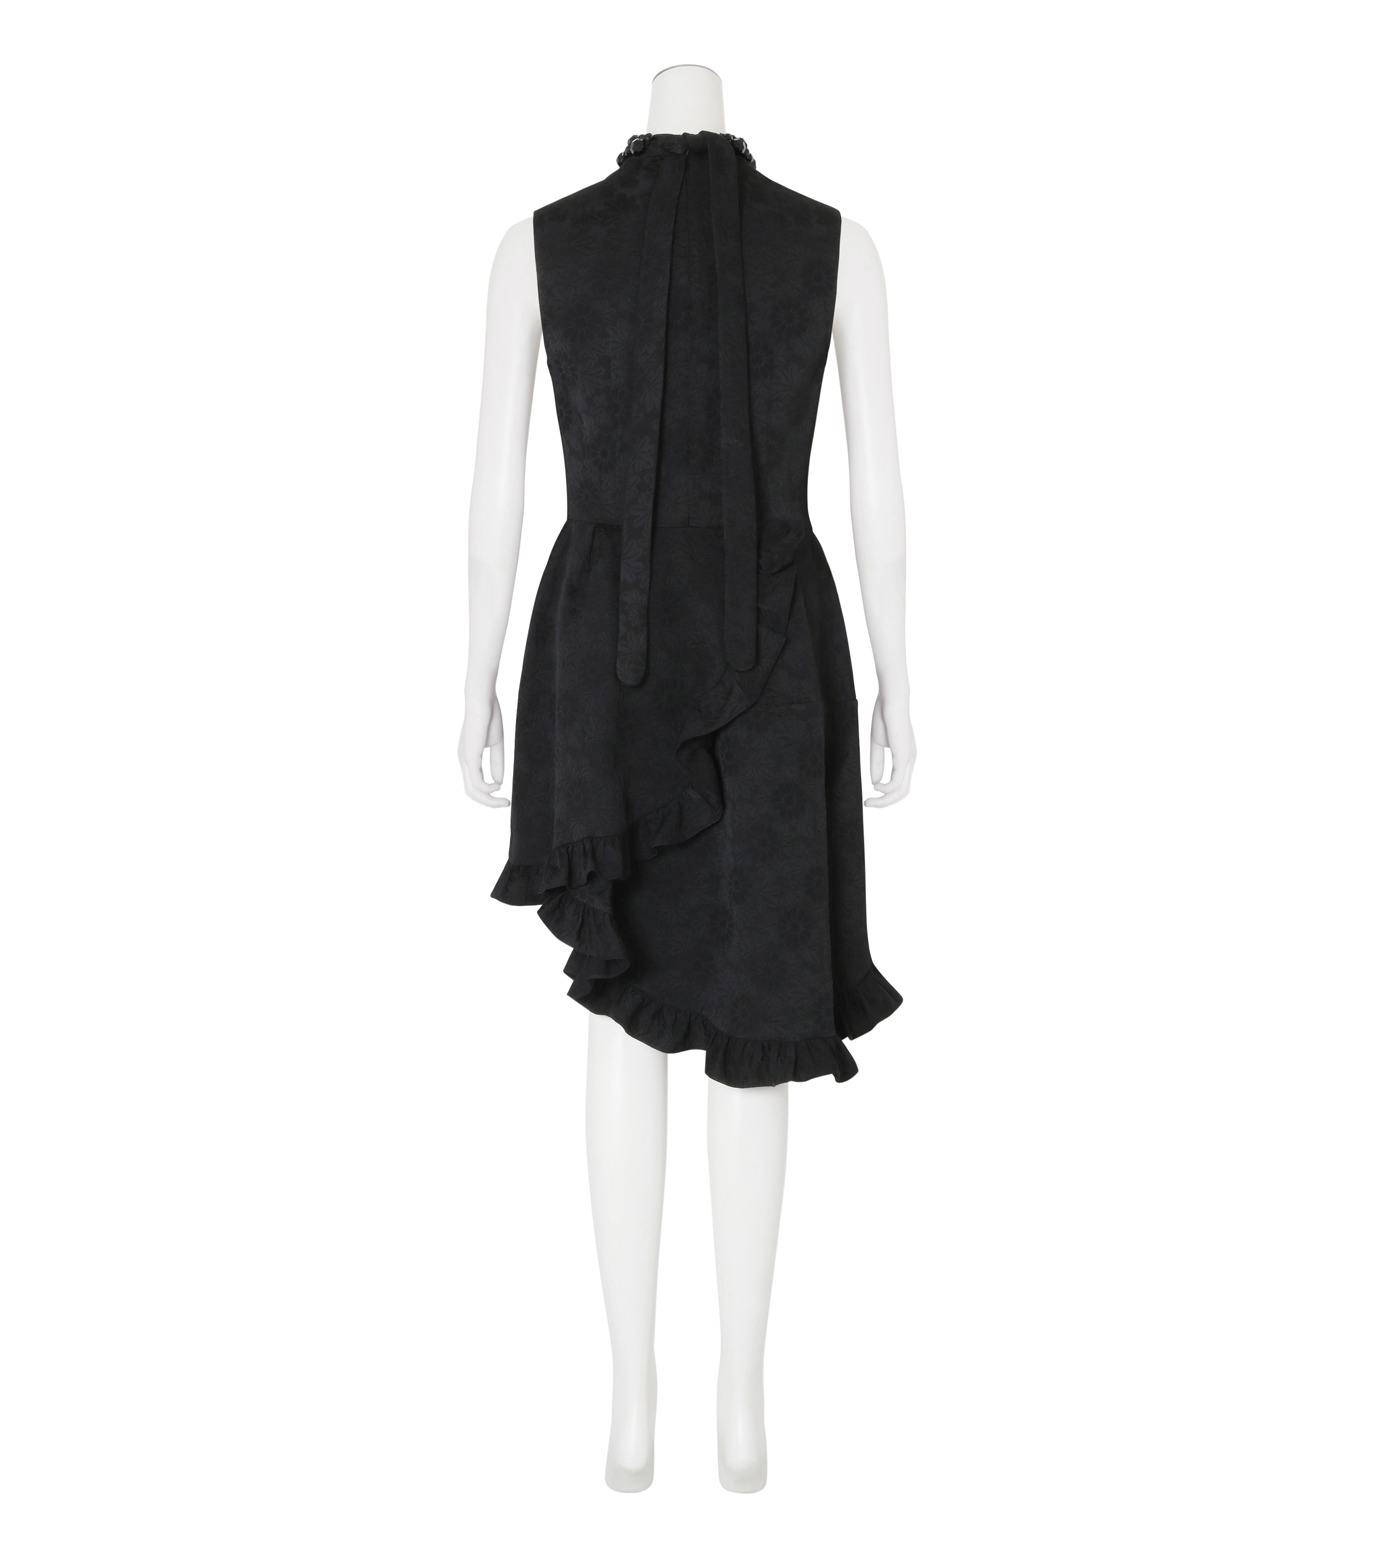 Simone Rocha(シモーネロシャ)のCotton Brocade Dress w/Beads-BLACK(ワンピース/one piece)-3749B-13 拡大詳細画像2